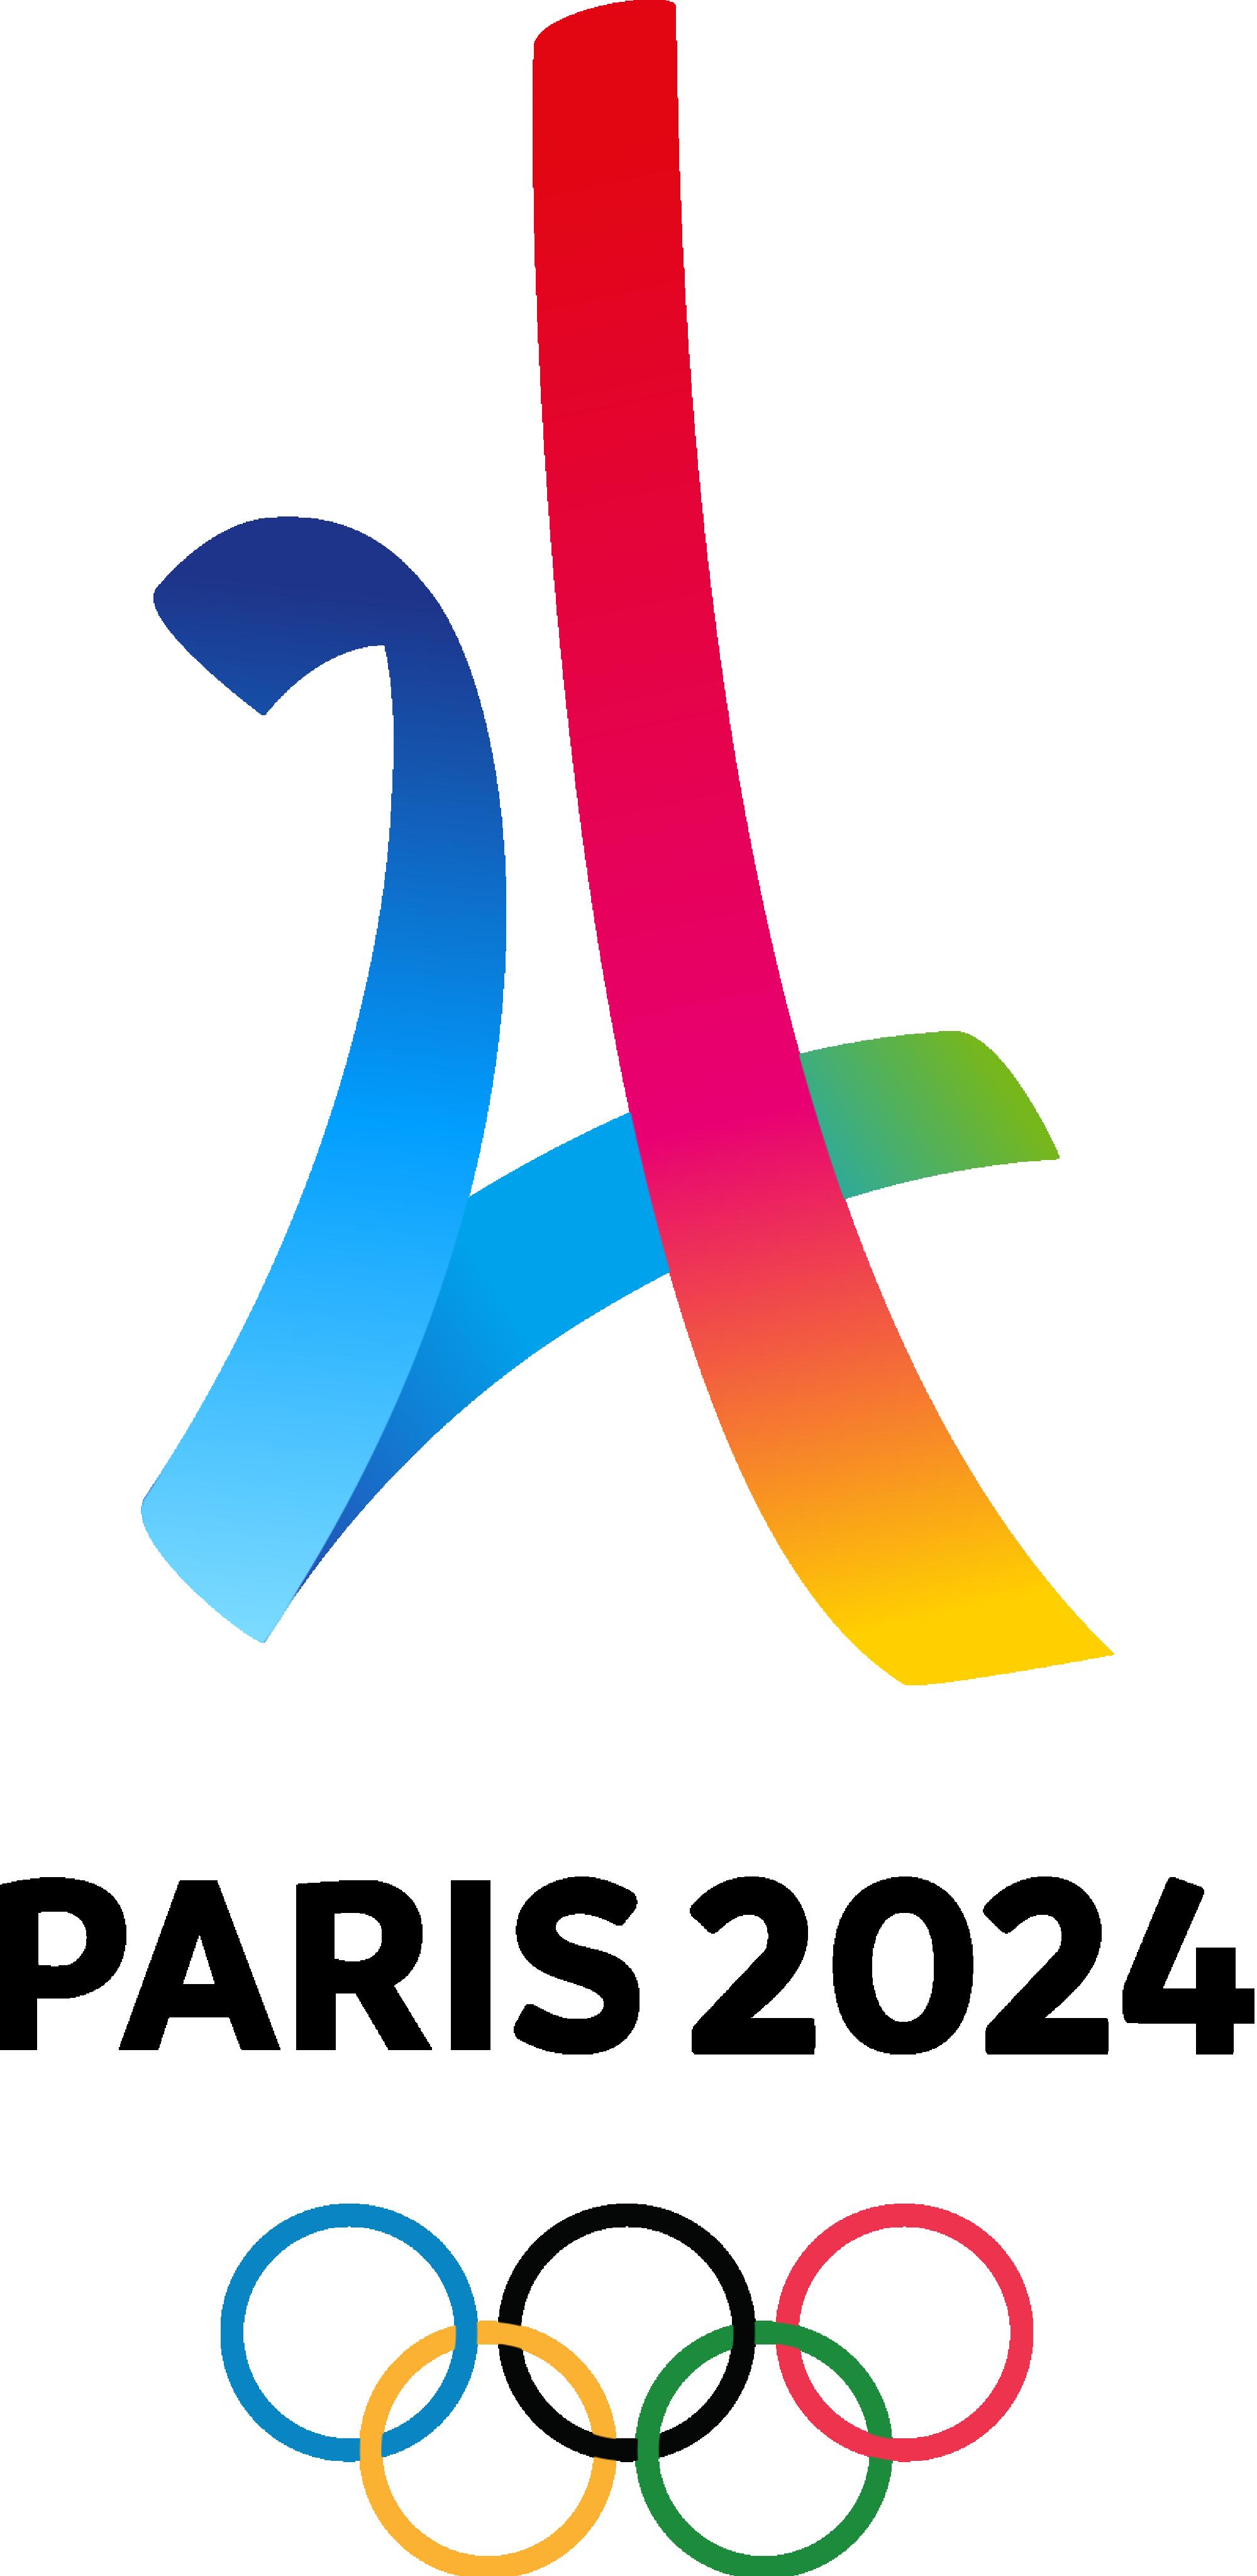 Логотип летней Олимпиады-2024